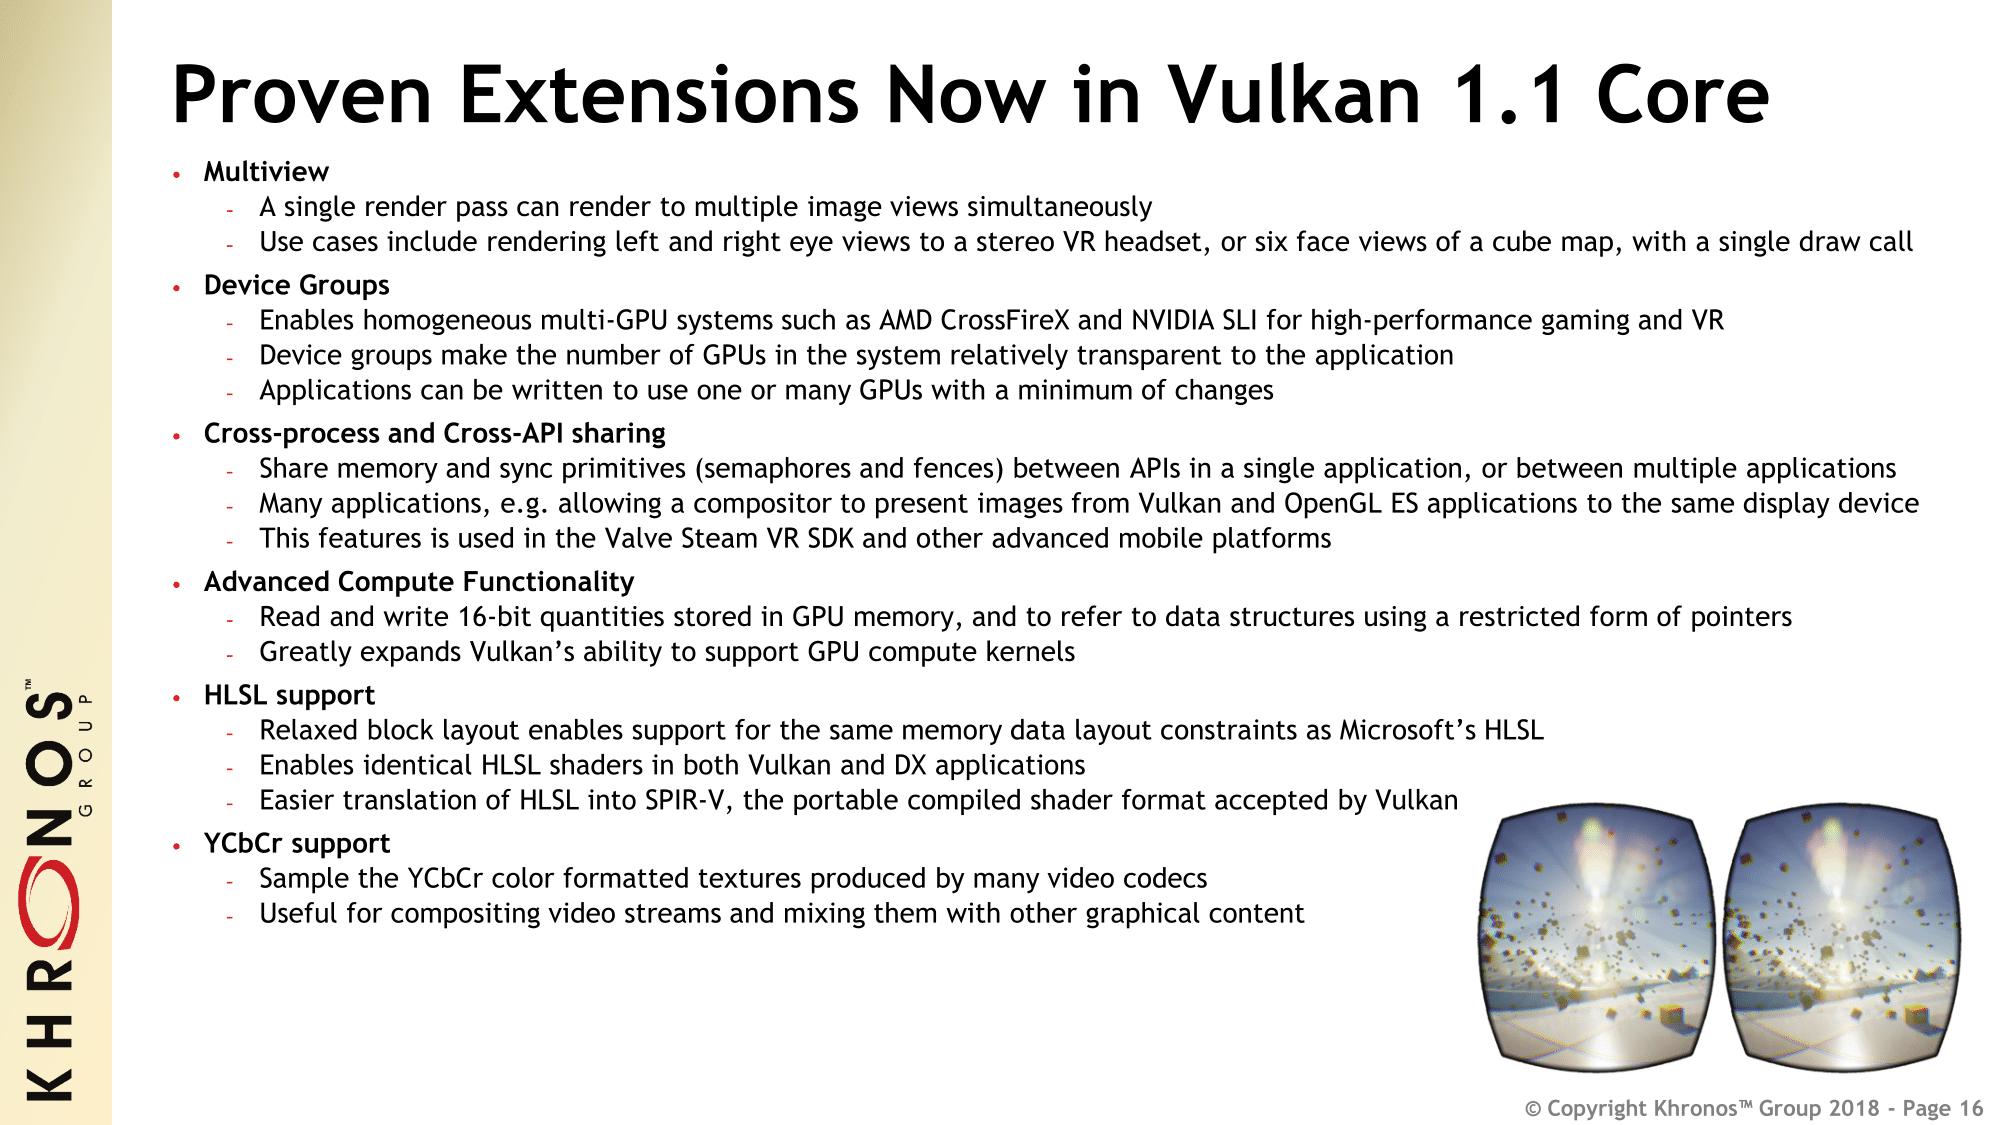 Vulkan 1 1 Specification Released: Open-source Tools, SDKs